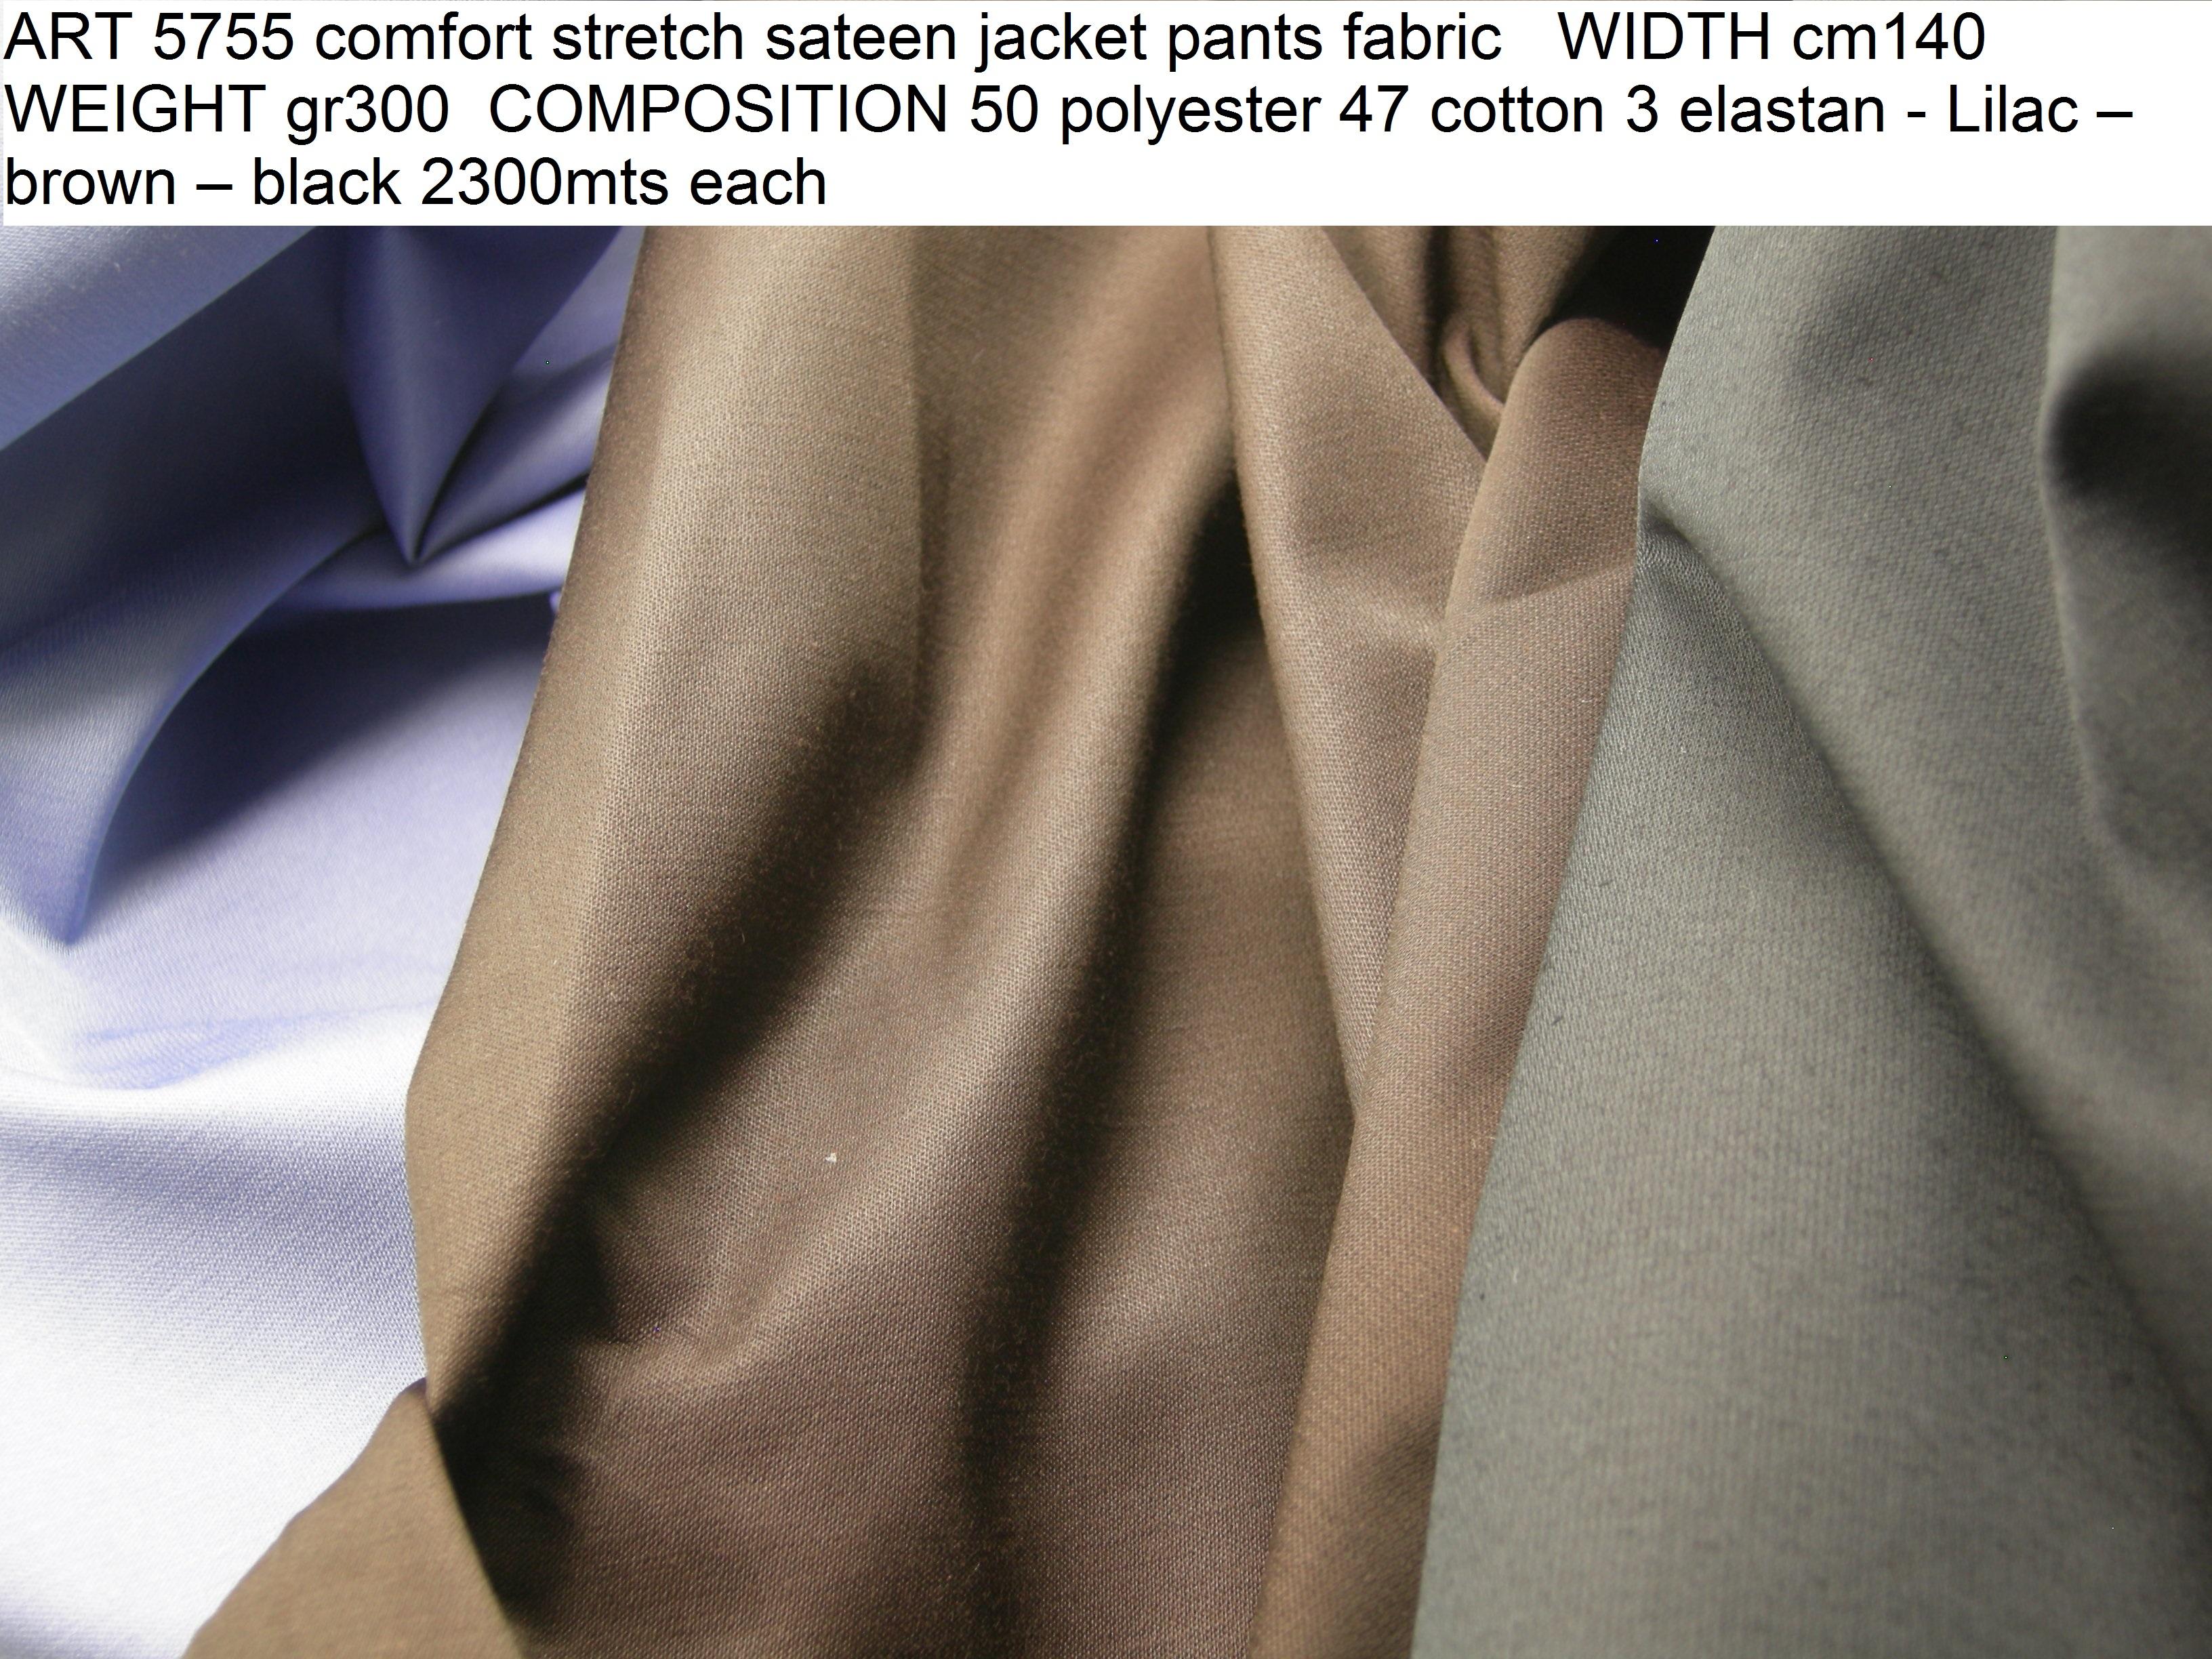 ART 5755 comfort stretch sateen jacket pants fabric WIDTH cm140 WEIGHT gr300 COMPOSITION 50 polyester 47 cotton 3 elastan - Lilac – brown – black 2300mts each